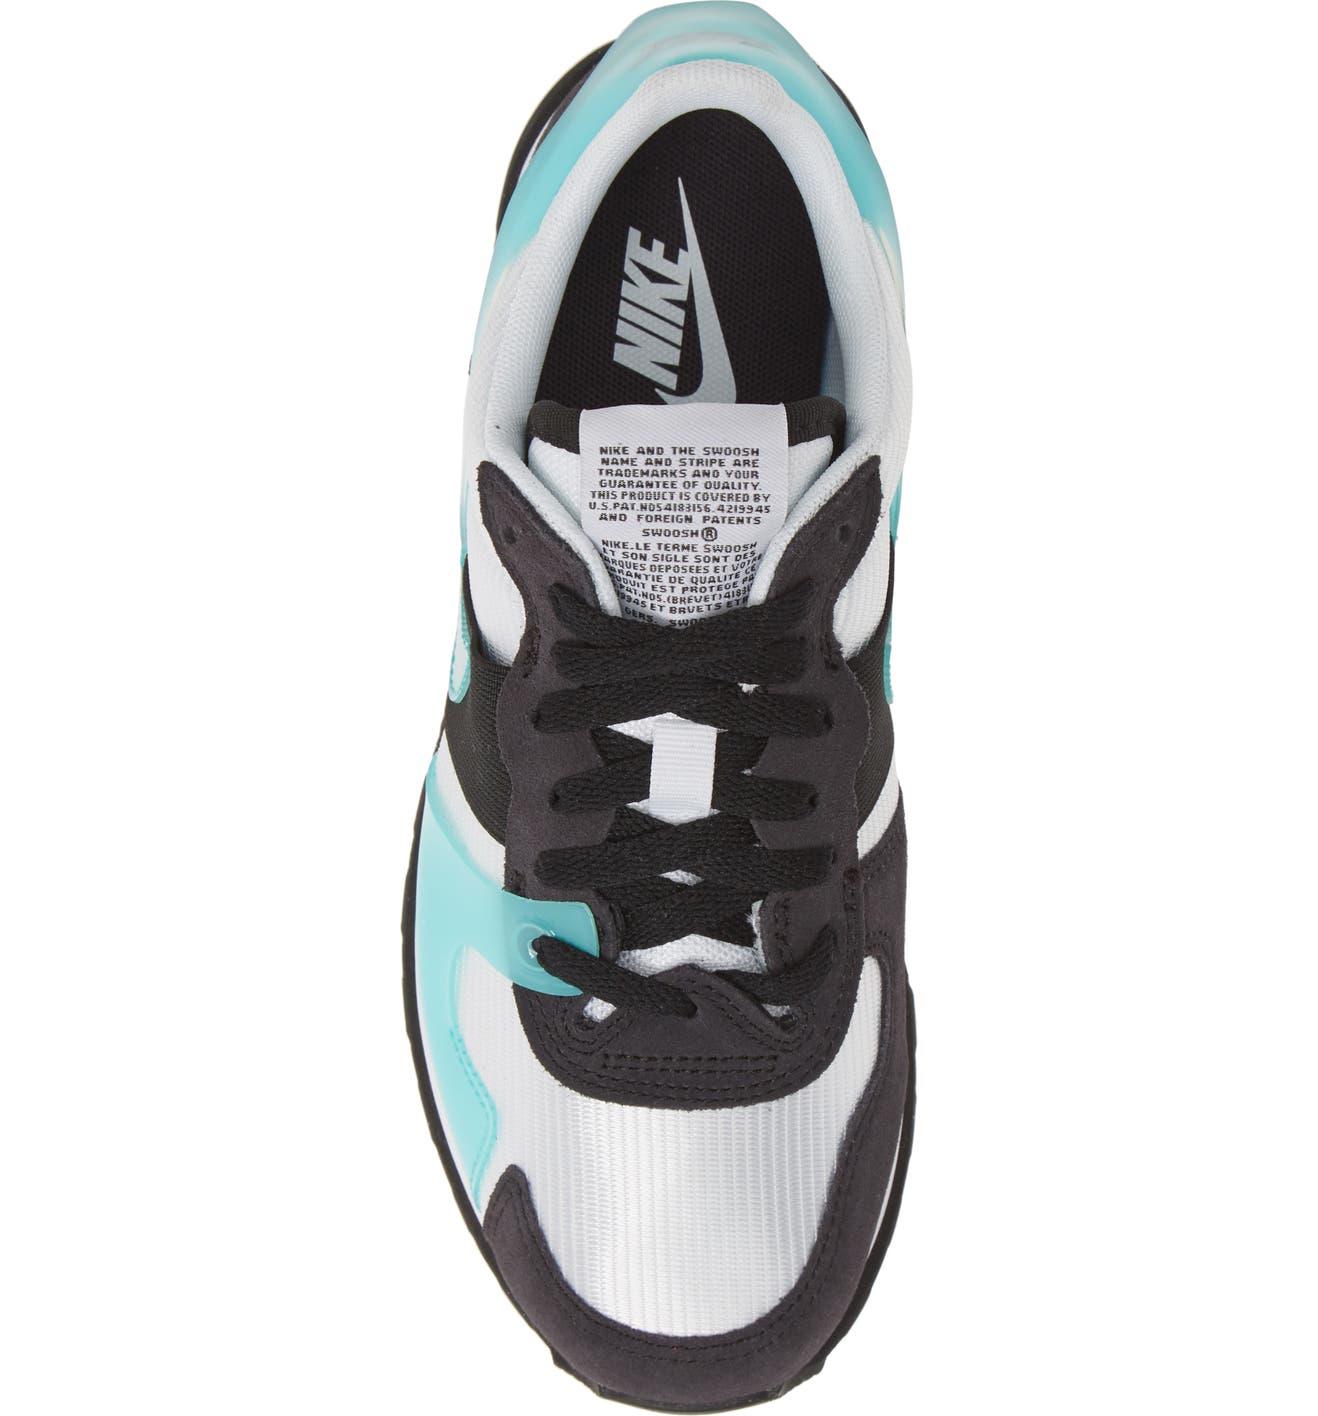 low priced cdeea bb1a6 Nike V-Love O.X. Sneaker (Women)   Nordstrom